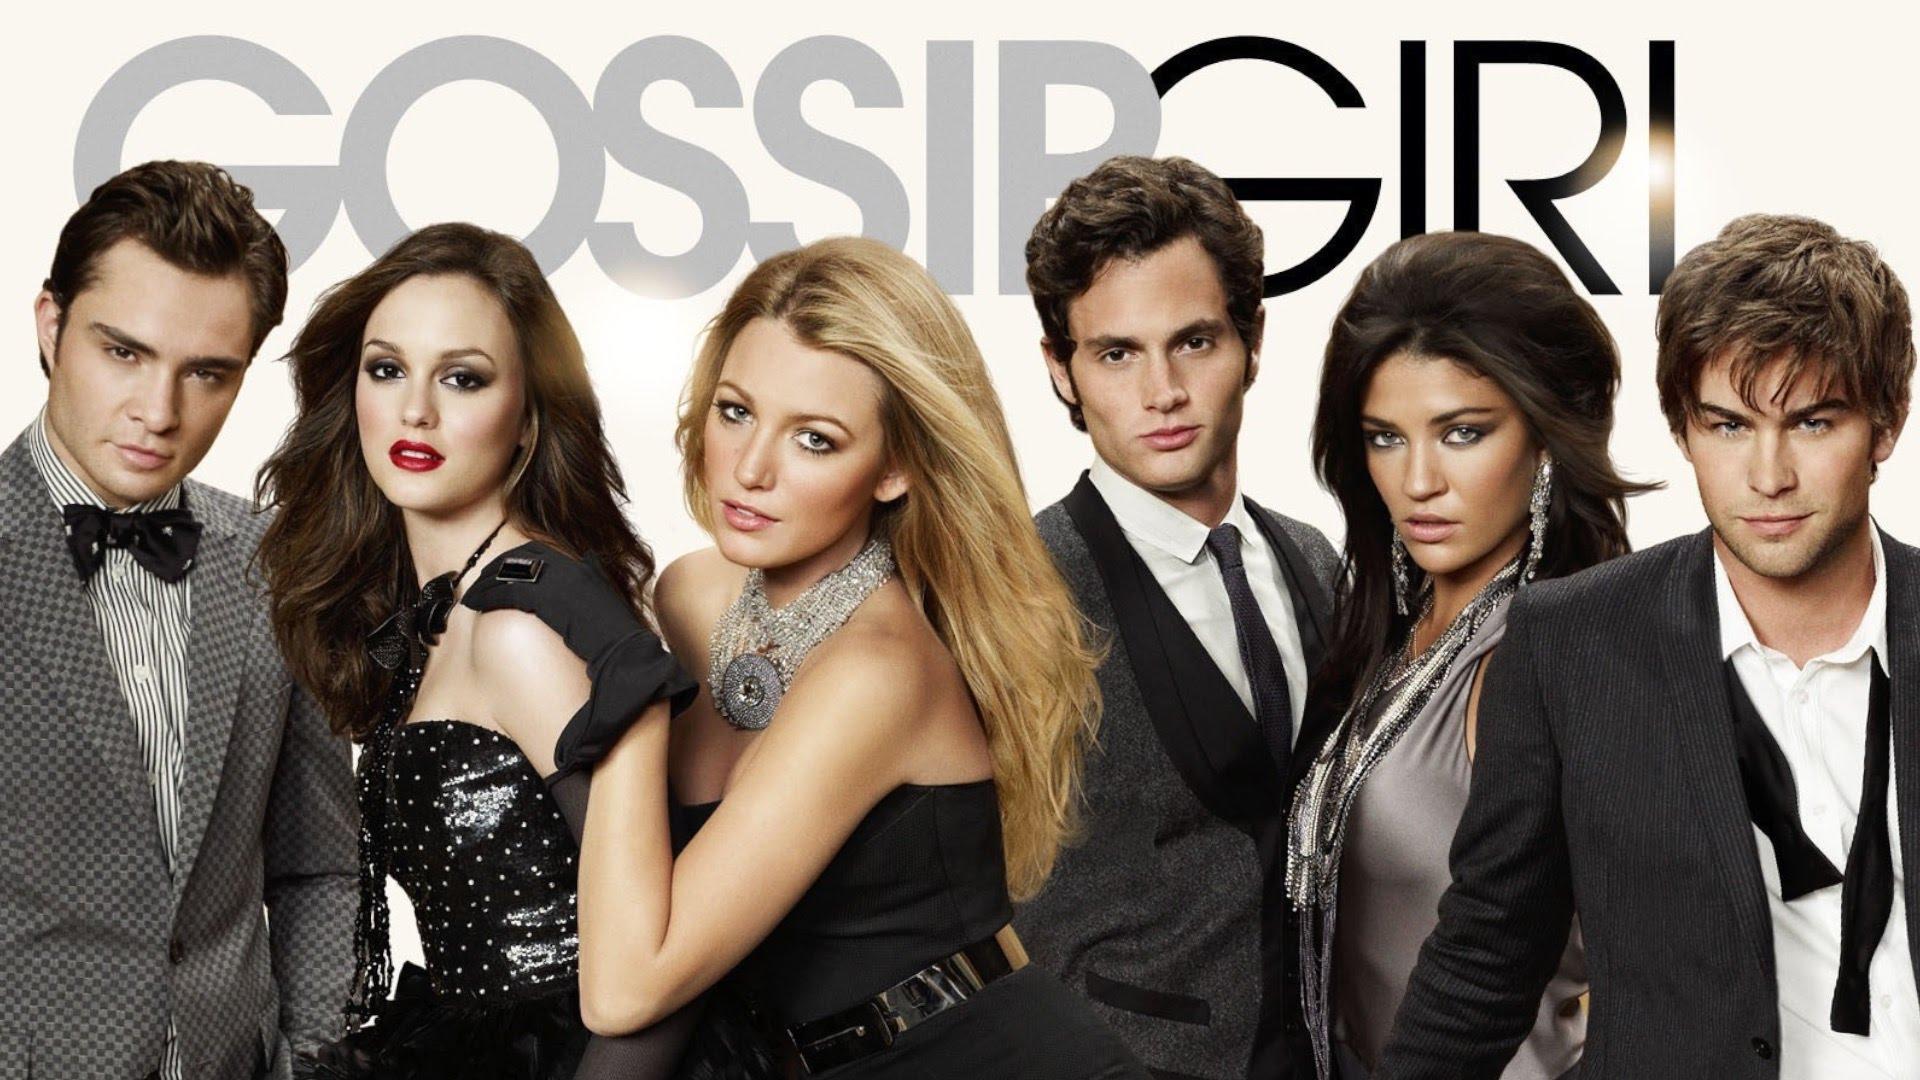 protagonisti gossip girl